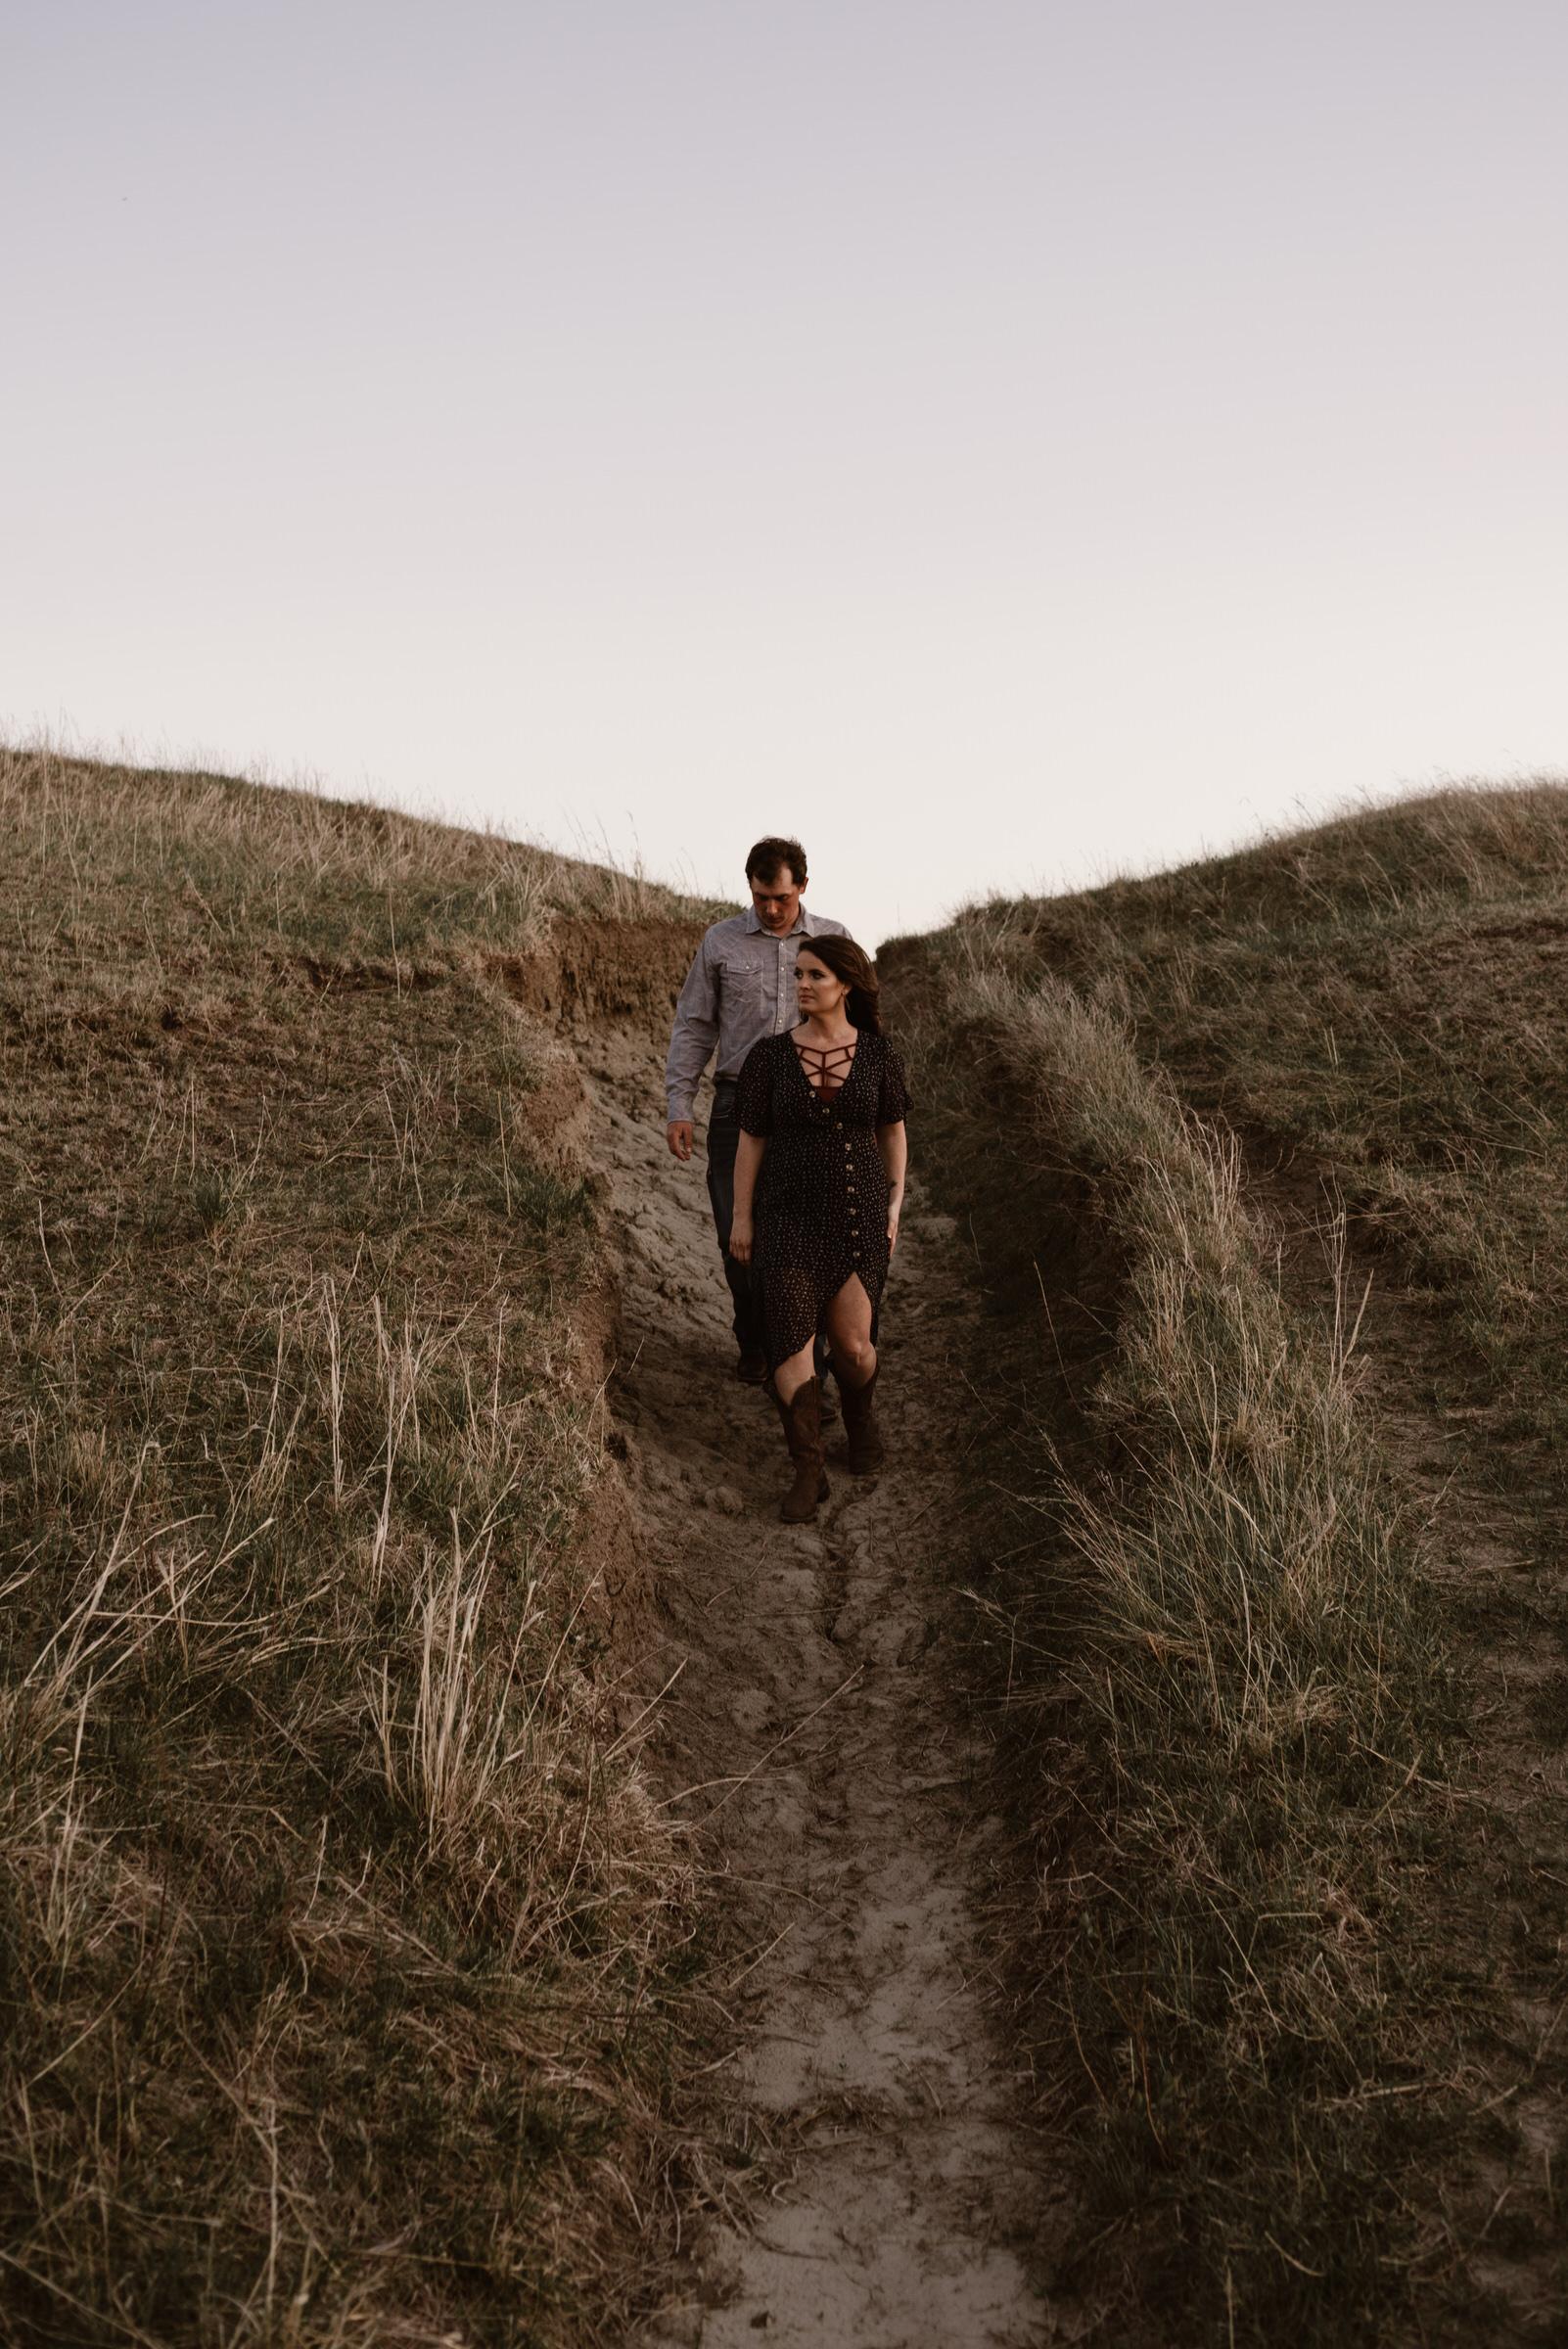 Sandhills-Nebraska-Engagement-Wedding-Photographer-Kaylie-Sirek-Photography-046.jpg